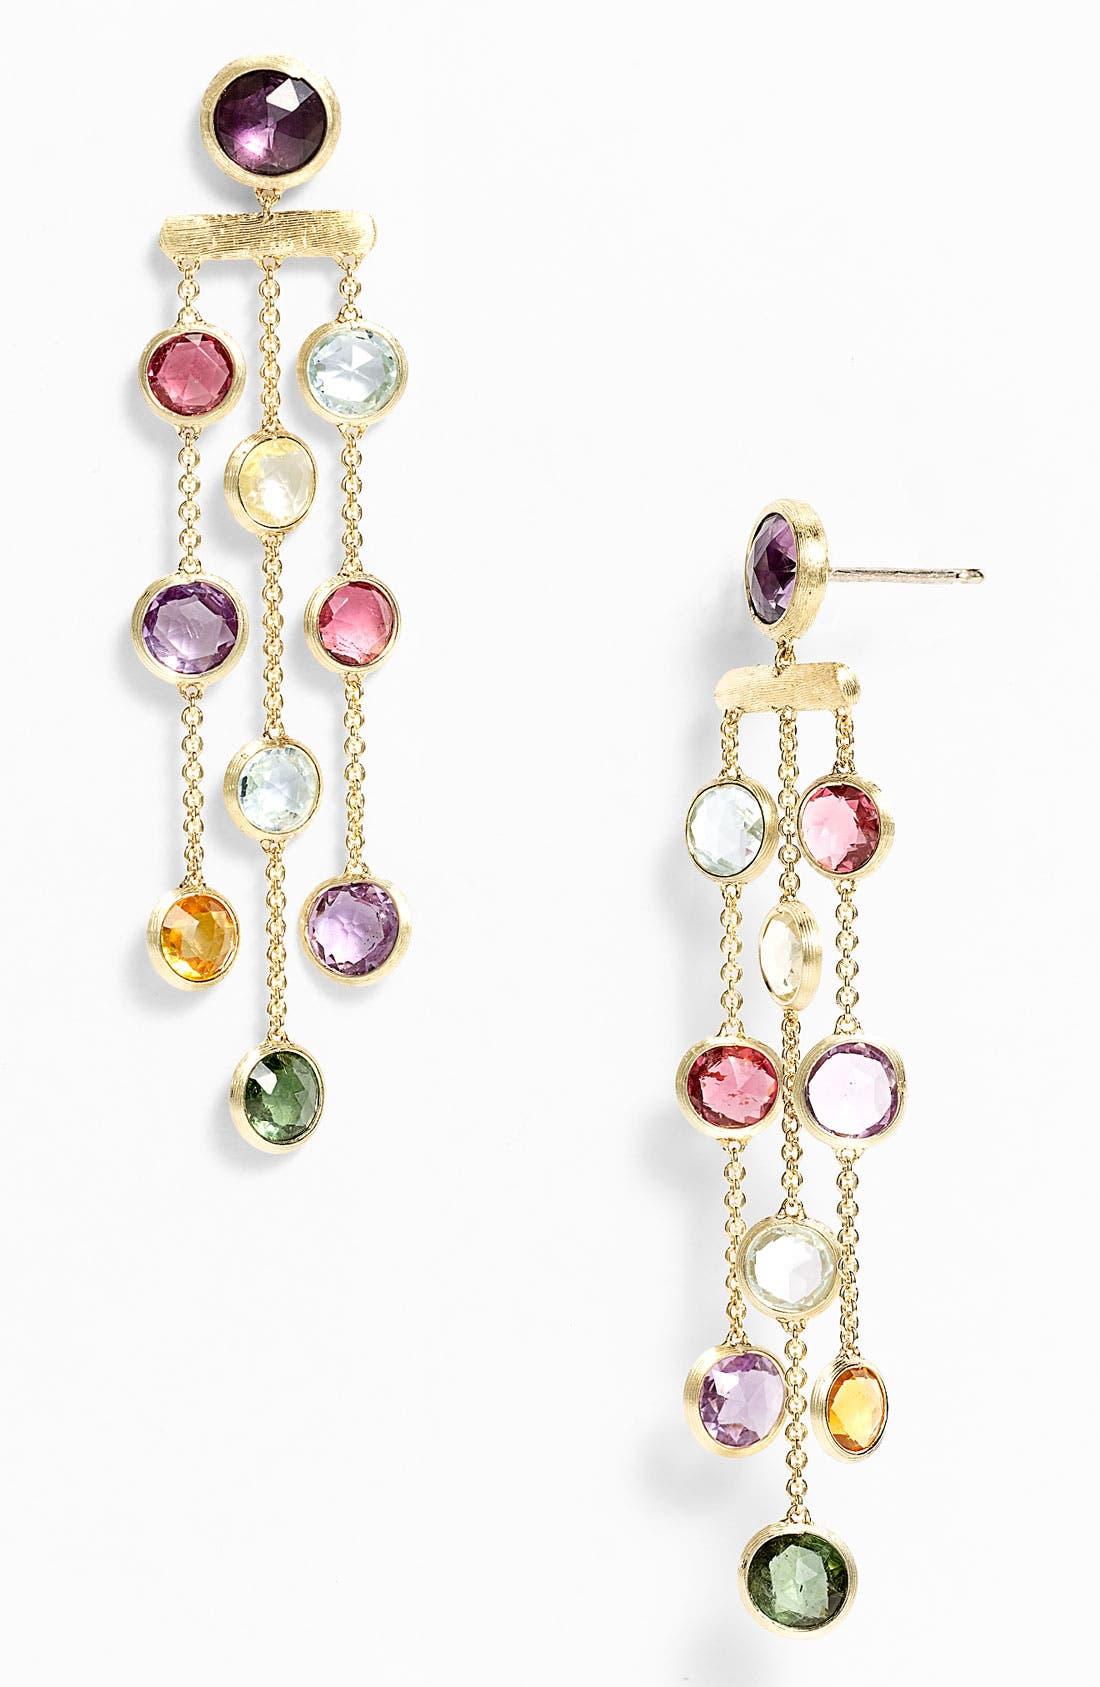 Main Image - Marco Bicego 'Mini Jaipur' Triple Strand Chandelier Earrings